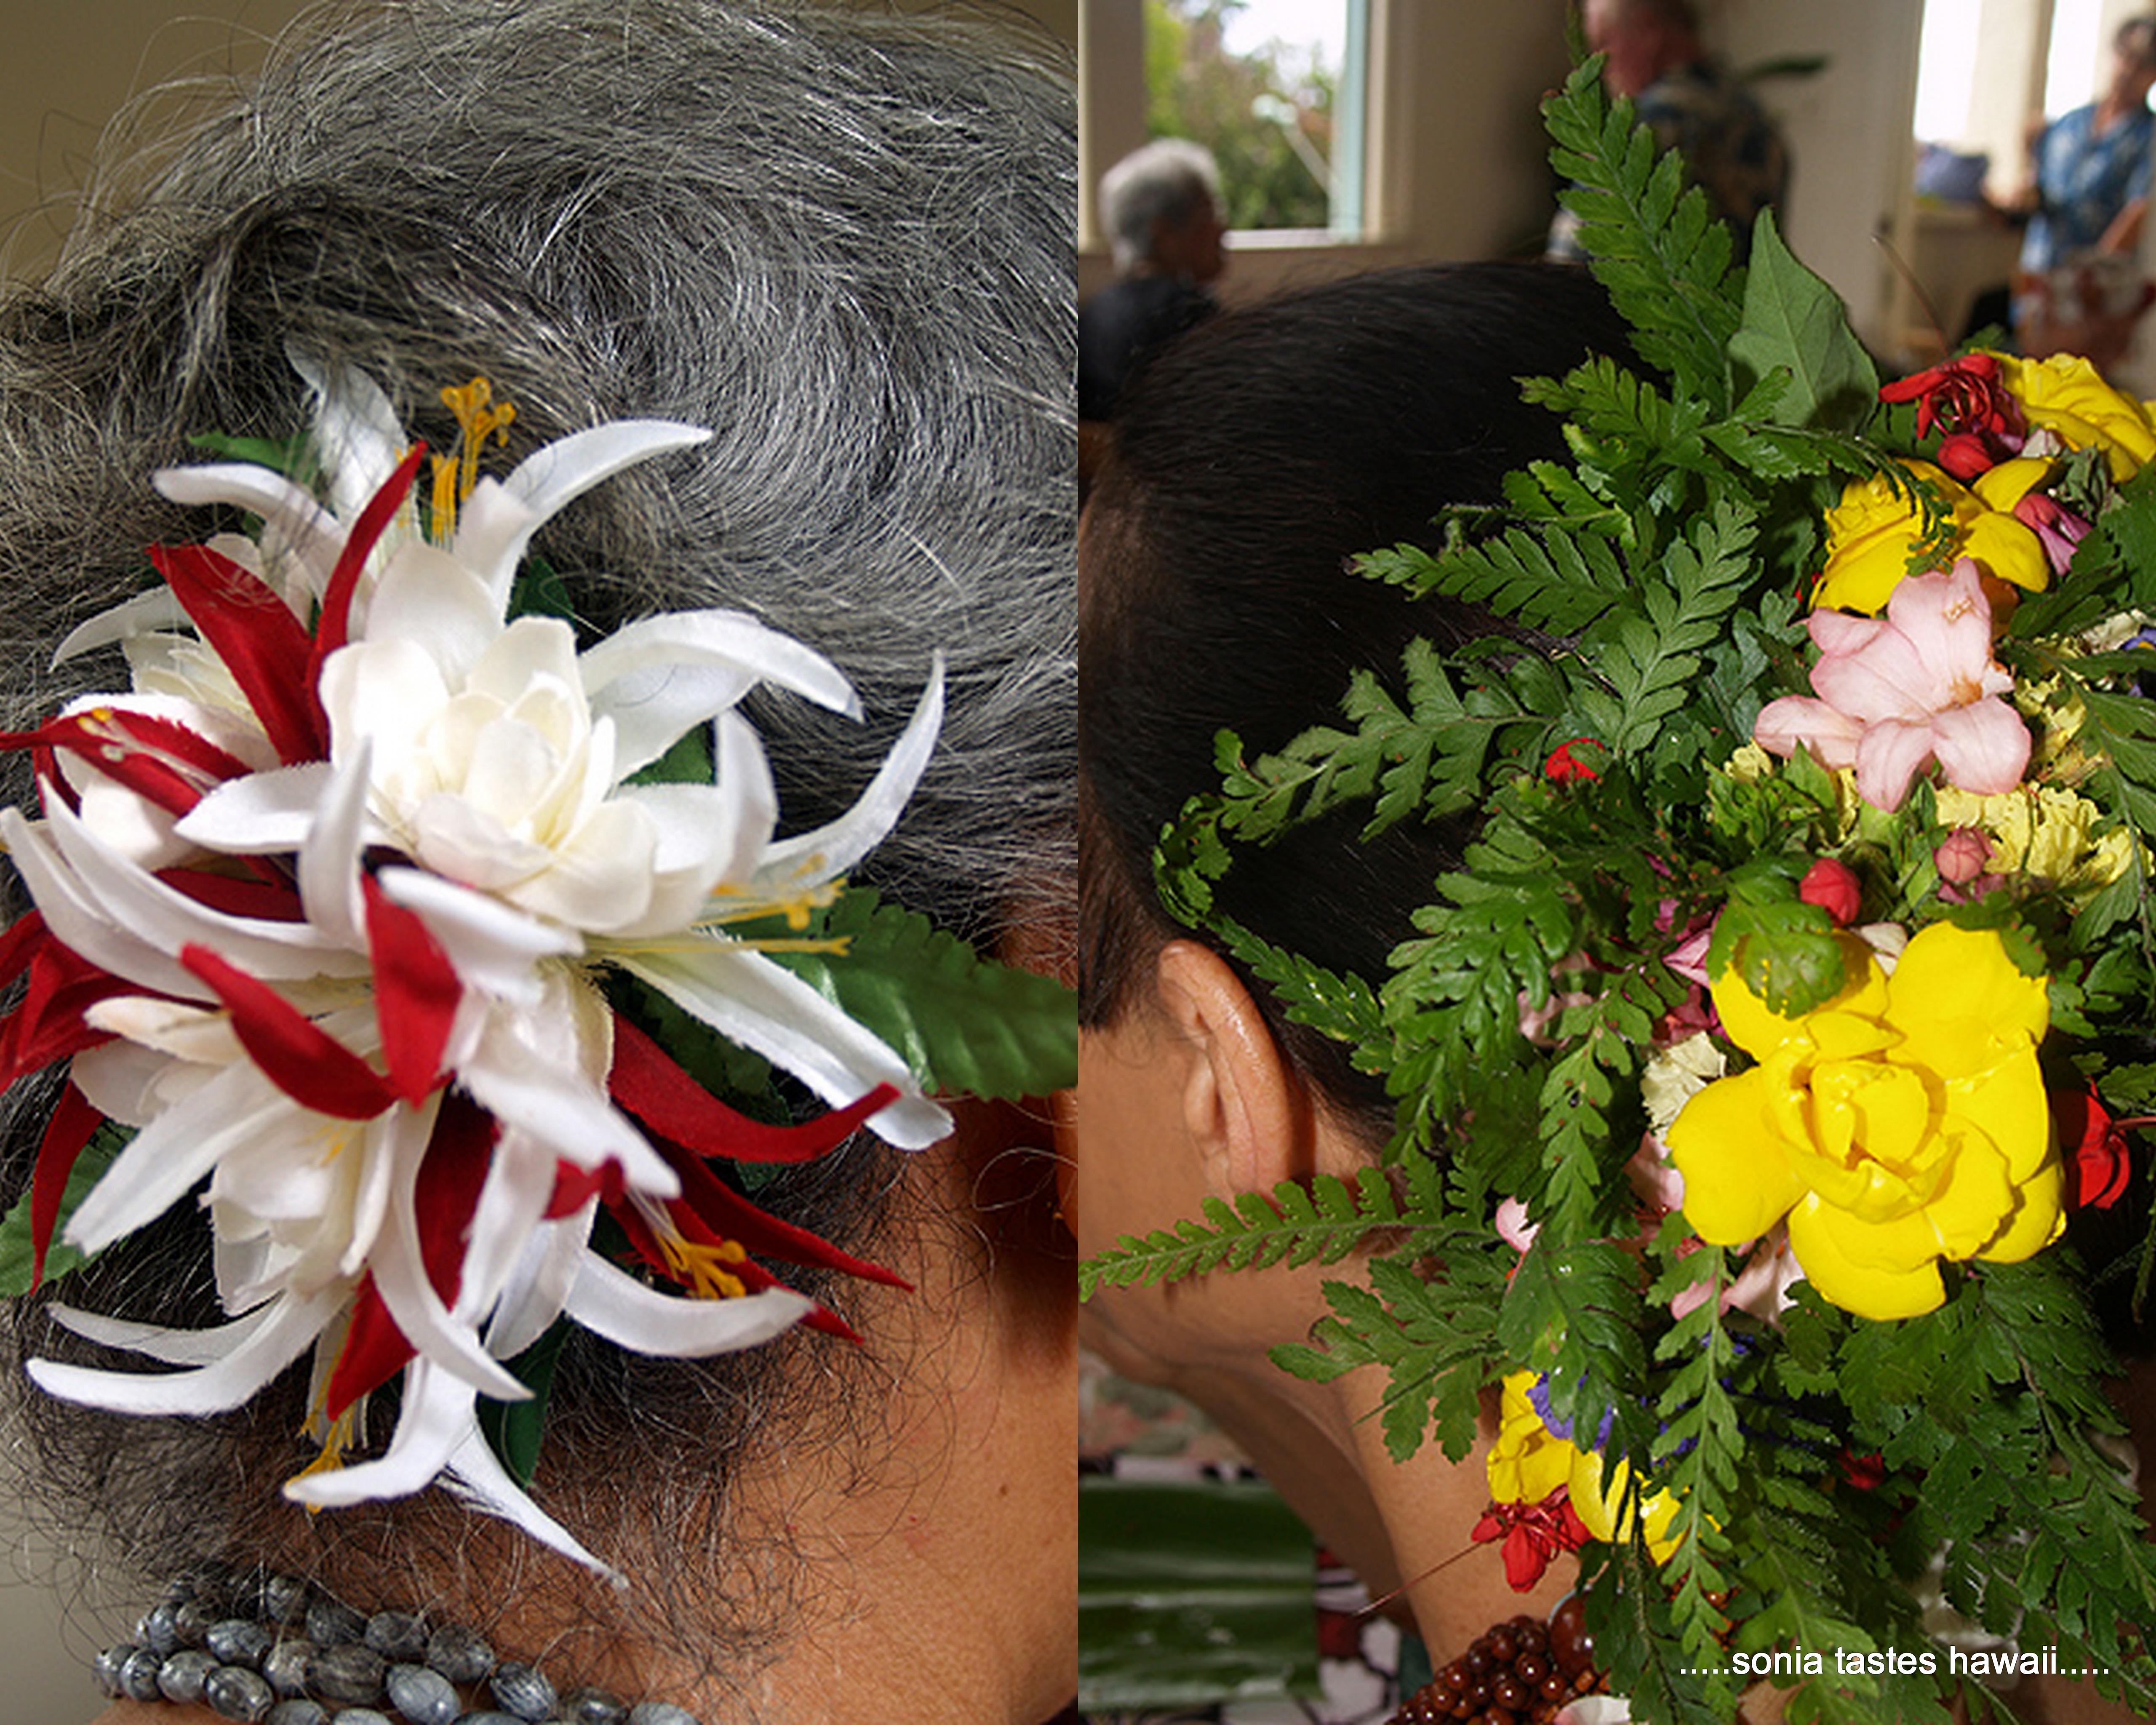 Sonia tastes hawaii may day is lei day in hawaii lei day 20122 izmirmasajfo Images